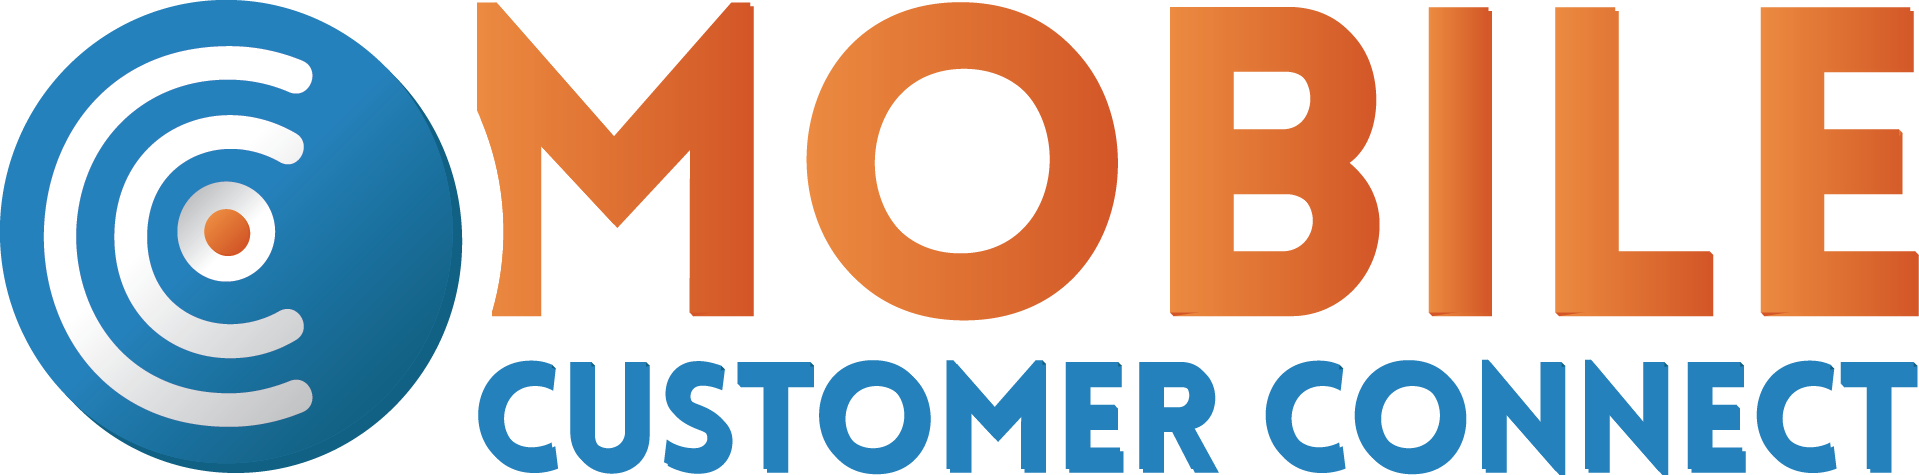 Mobile Customer Connect Logo